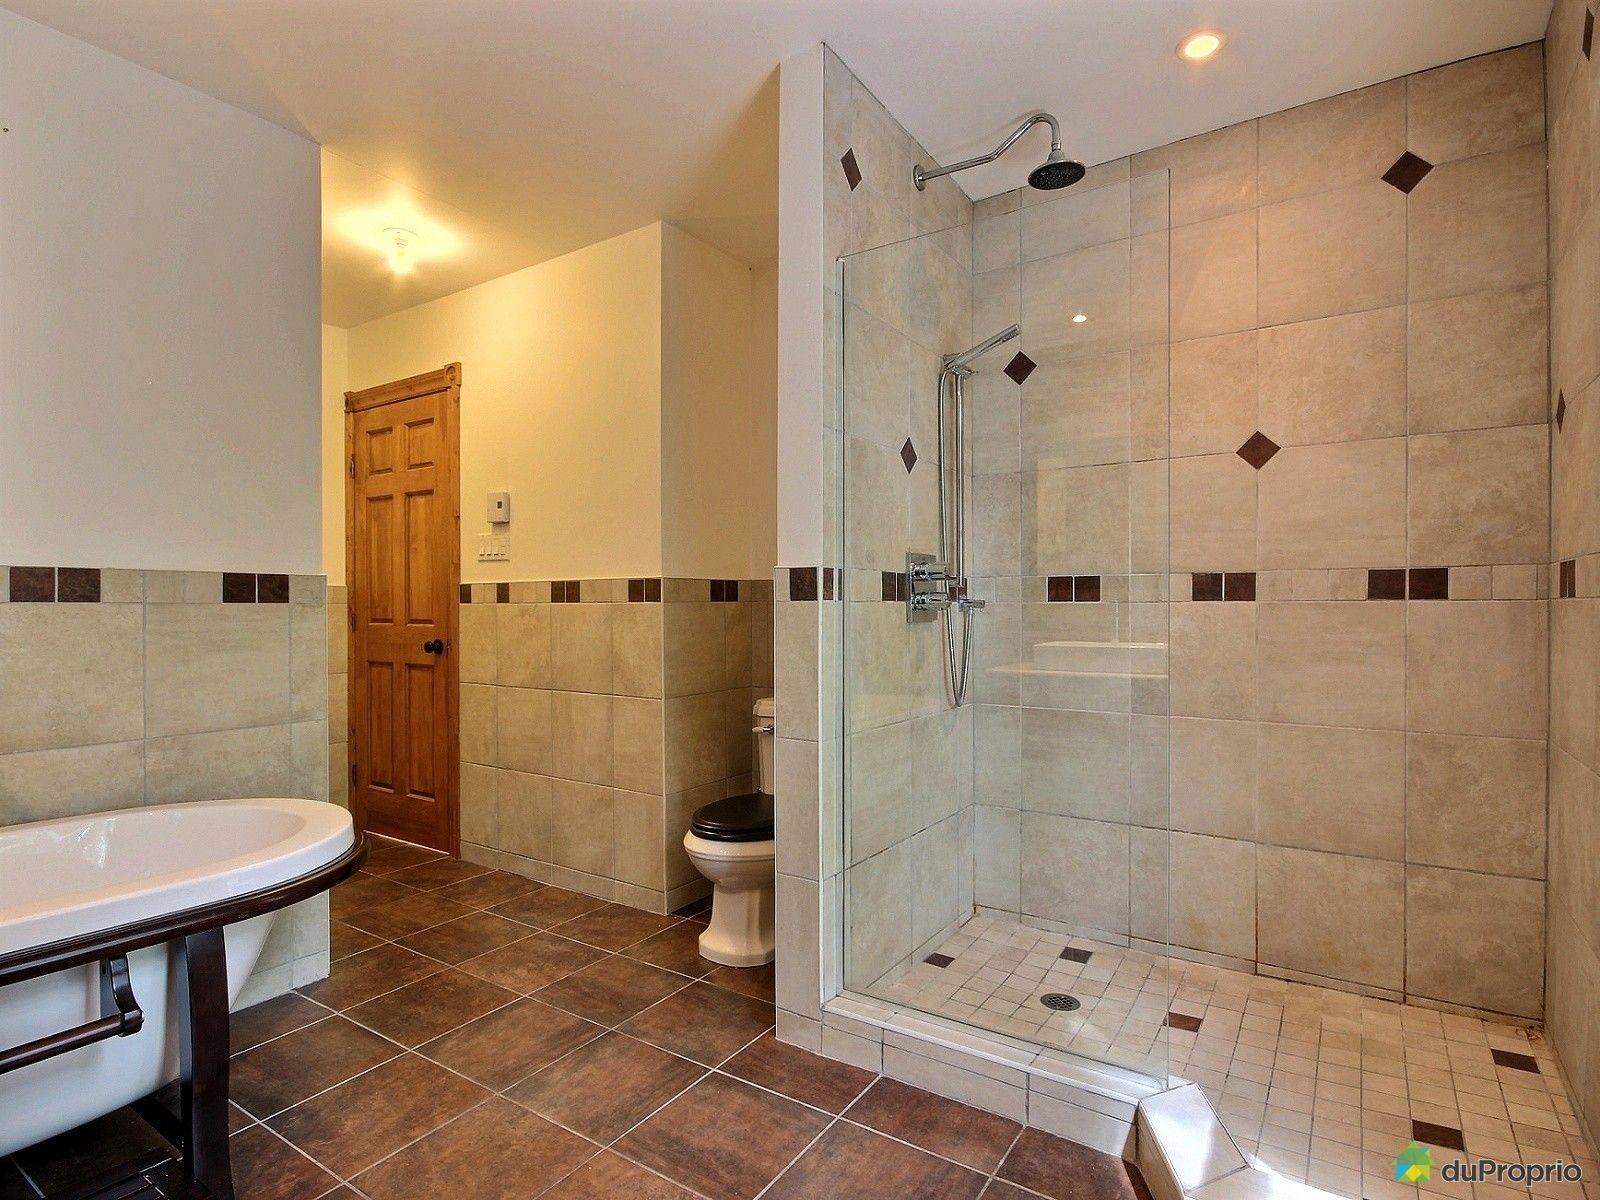 maison vendu montr al immobilier qu bec duproprio 621266. Black Bedroom Furniture Sets. Home Design Ideas